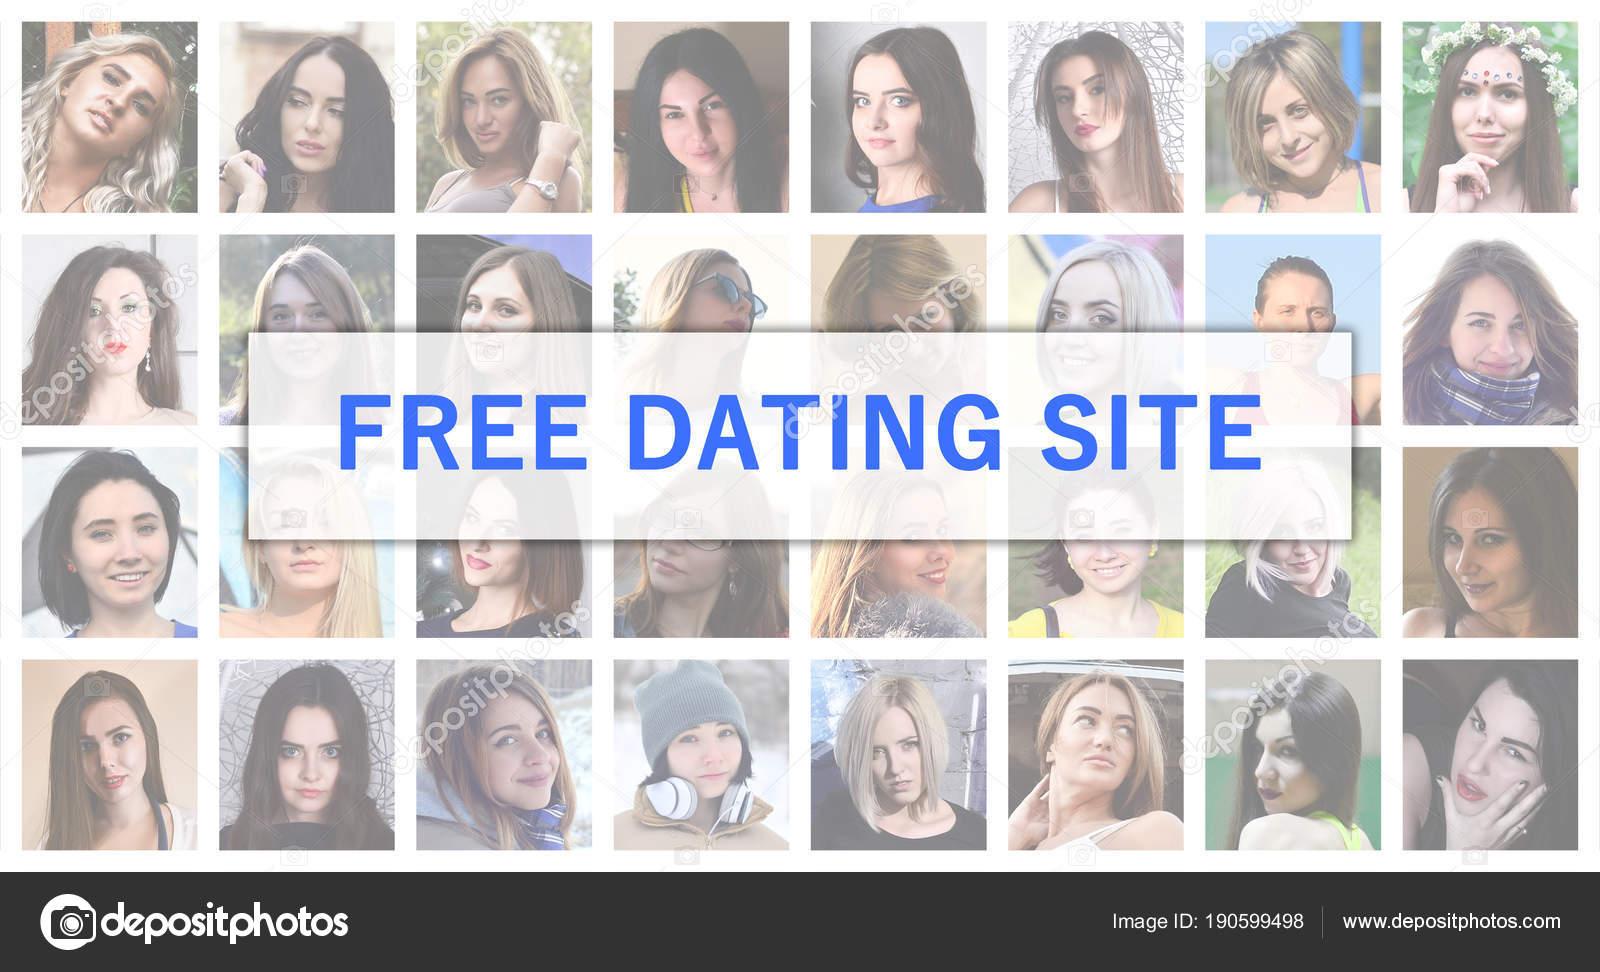 Bτην ιστοσελίδα γνωριμιών